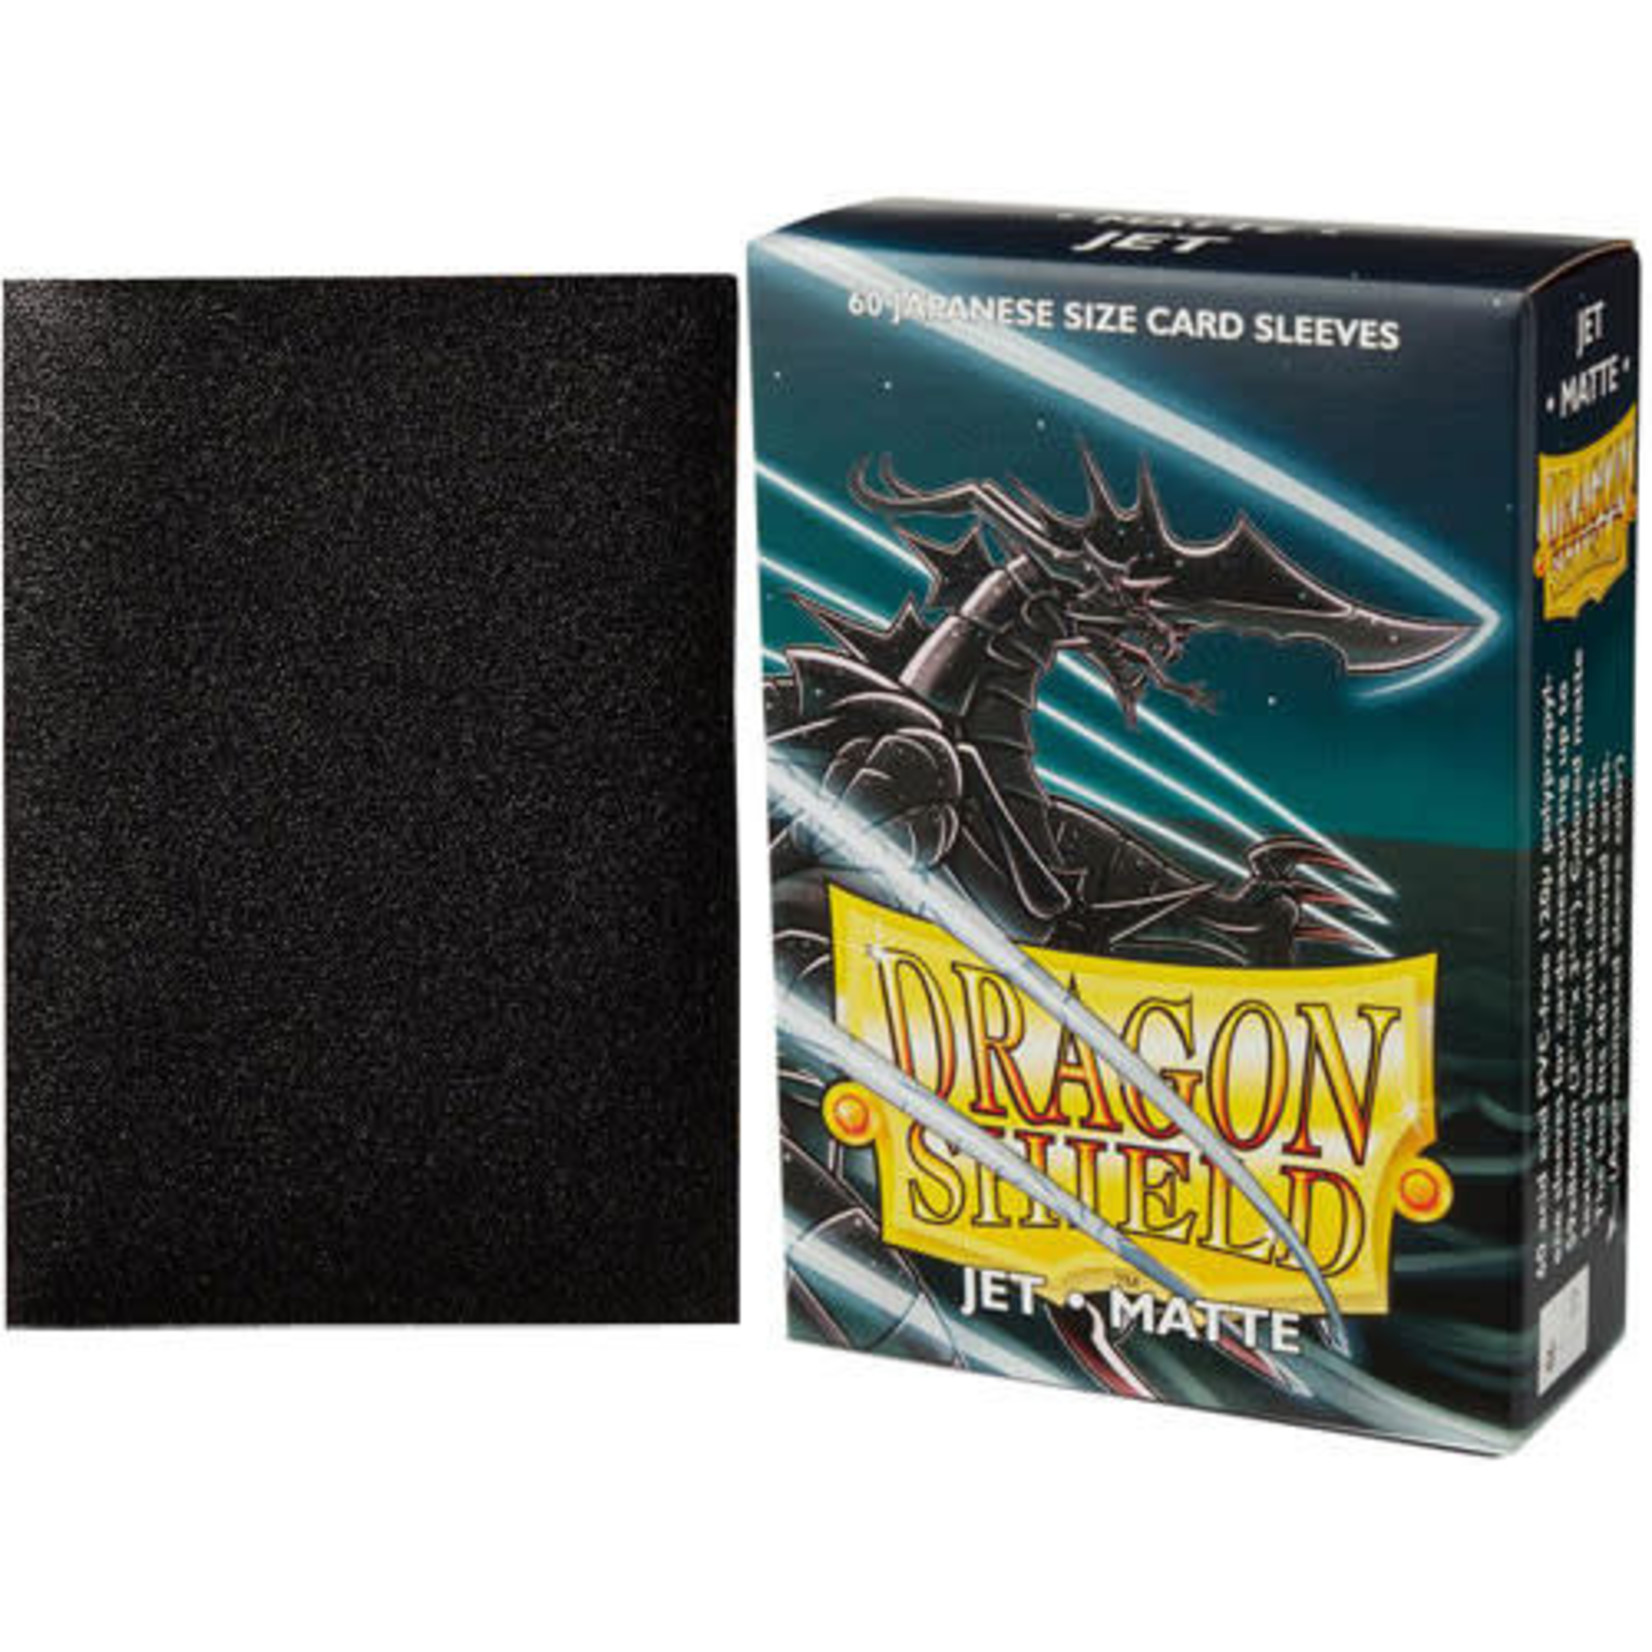 Dragon Shield Matte Jet (60 count) Small